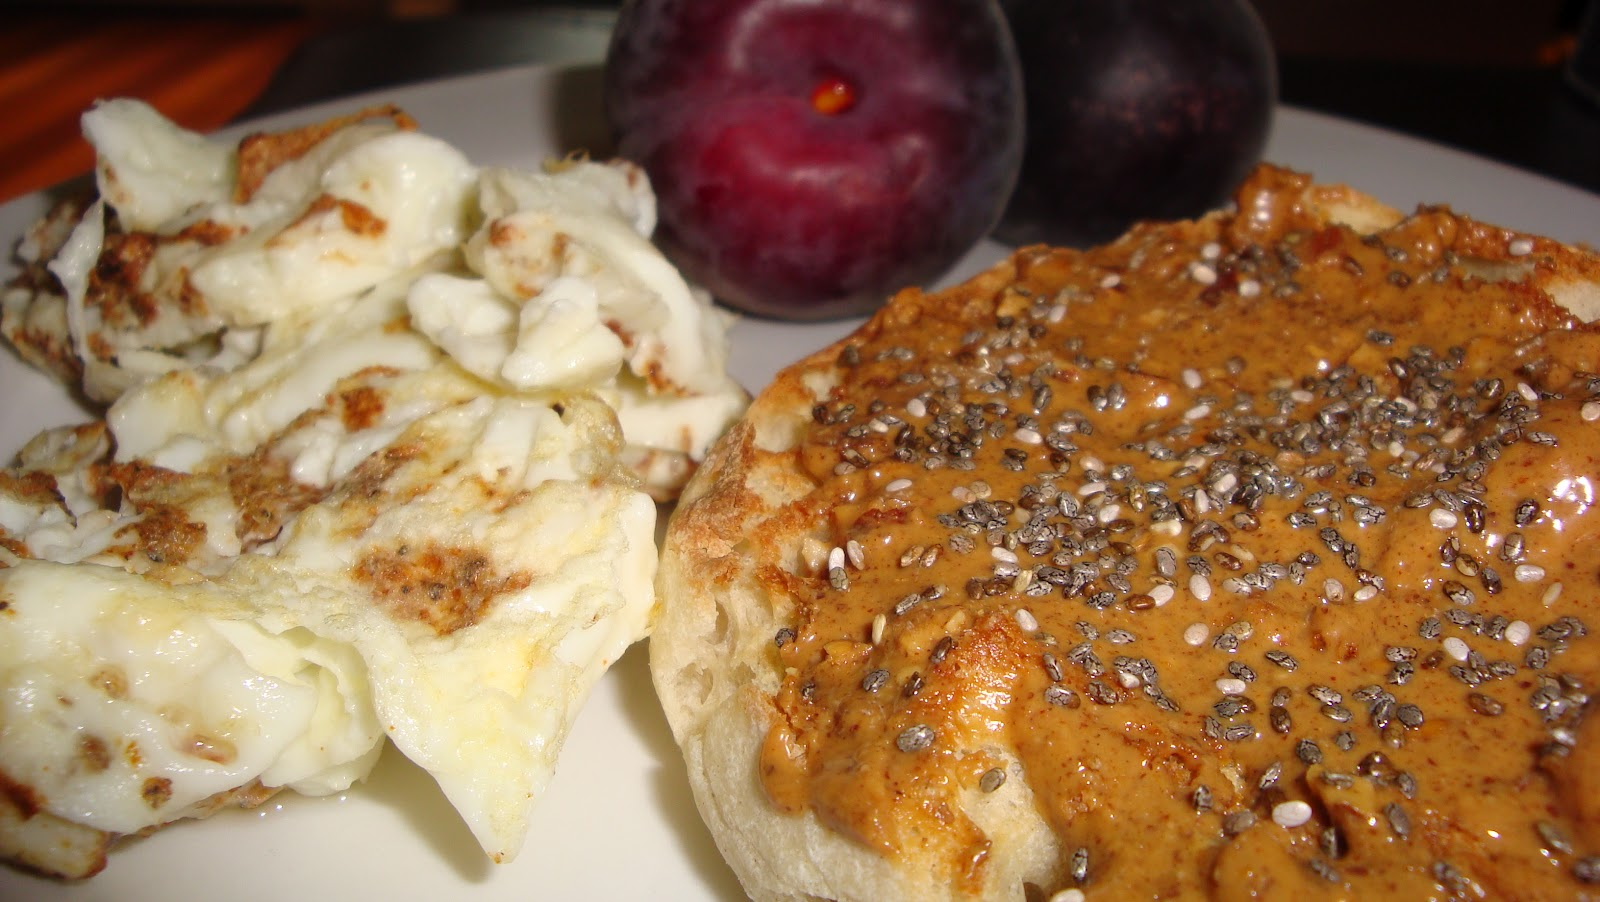 MassachusEATS: WIAW #20 and Make It: Unbelievable Chicken